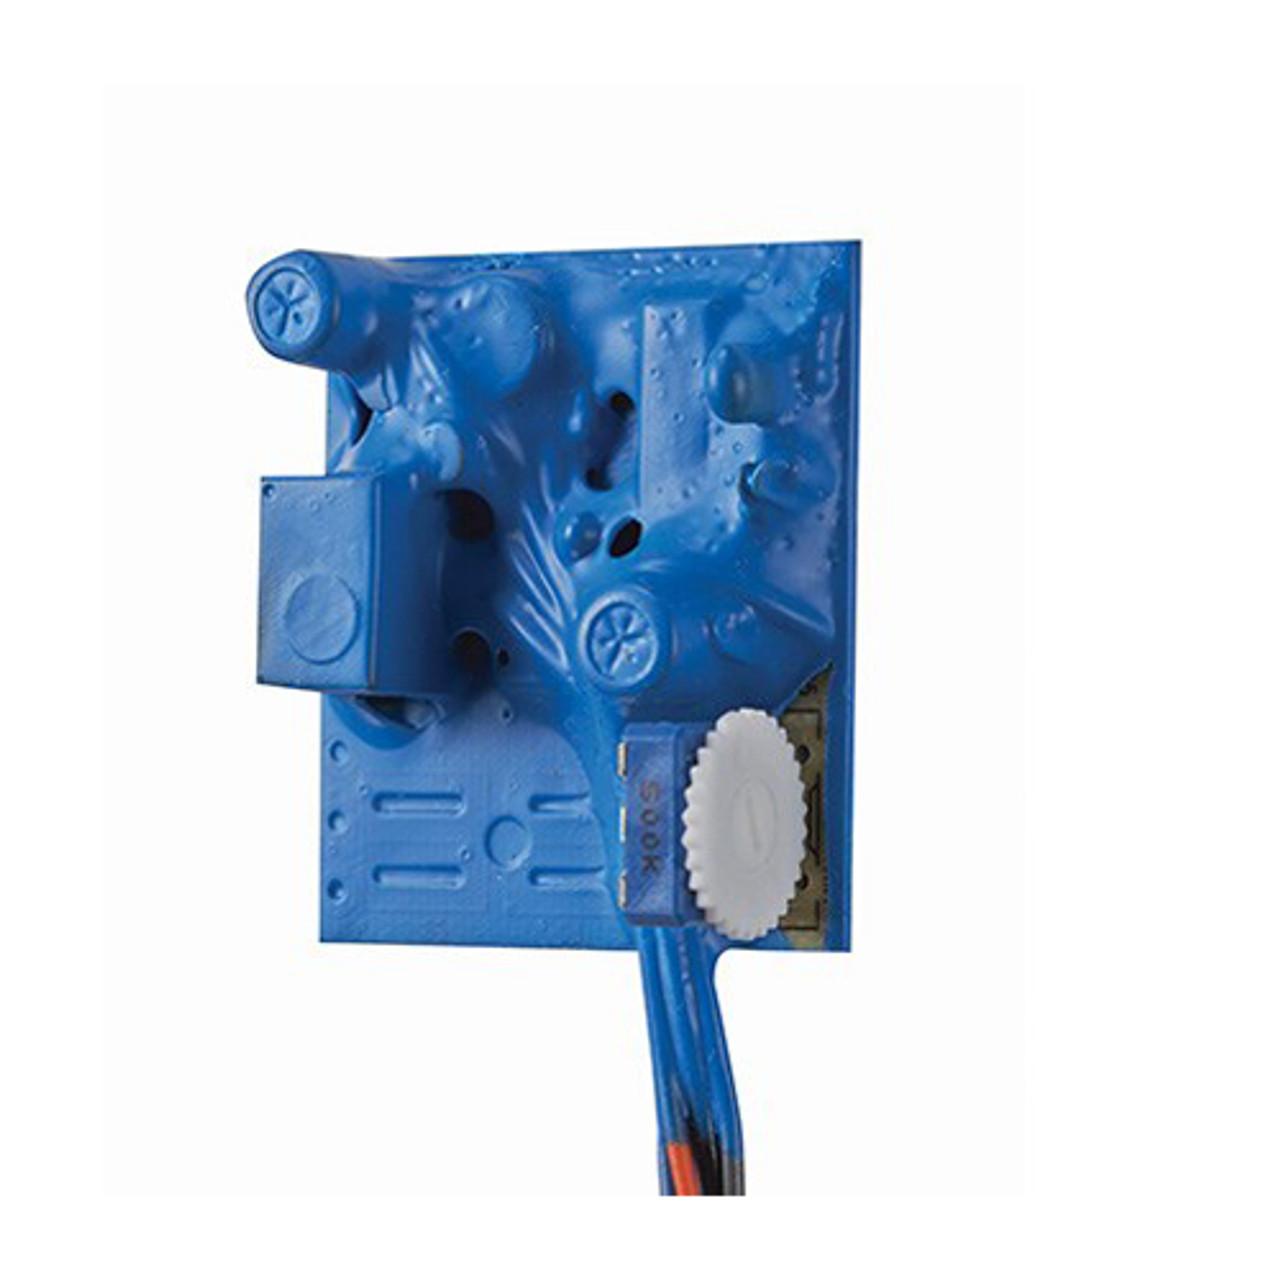 ASP-MT-1 ASP Alarm Control Programmable One Shot Mini-Timer